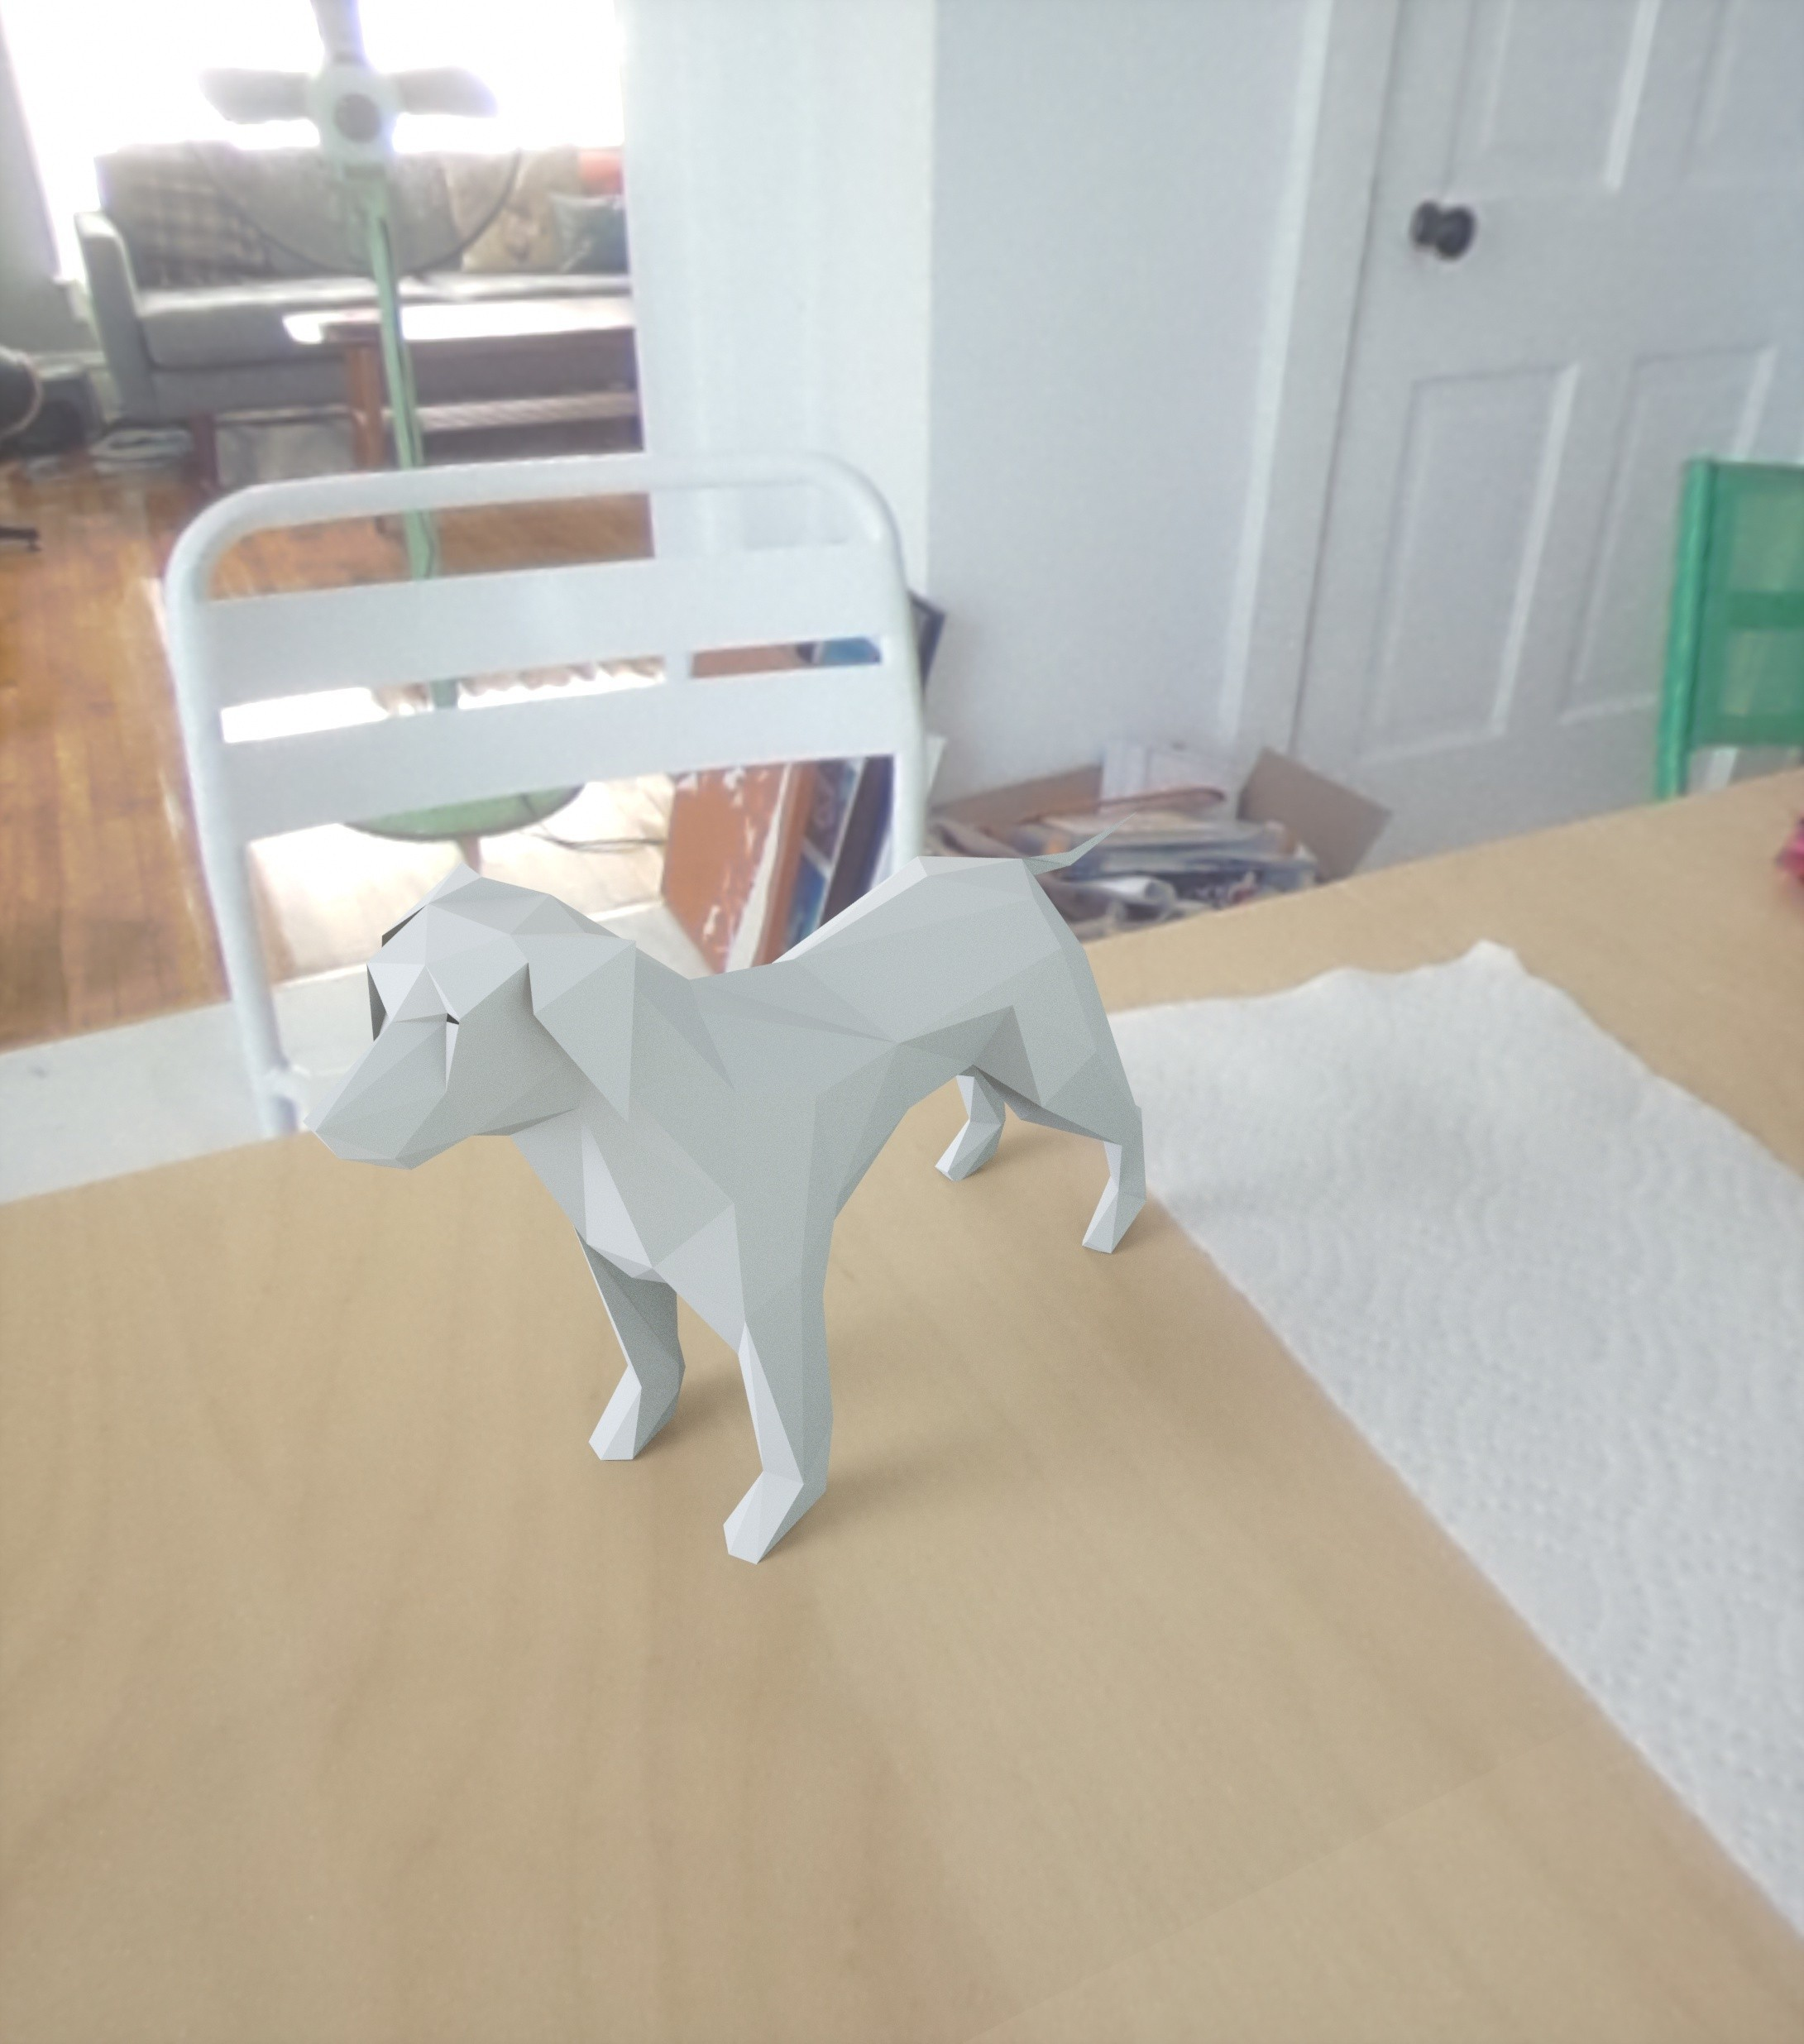 6.jpg Download free STL file low poly dog • 3D printable design, renderstefano